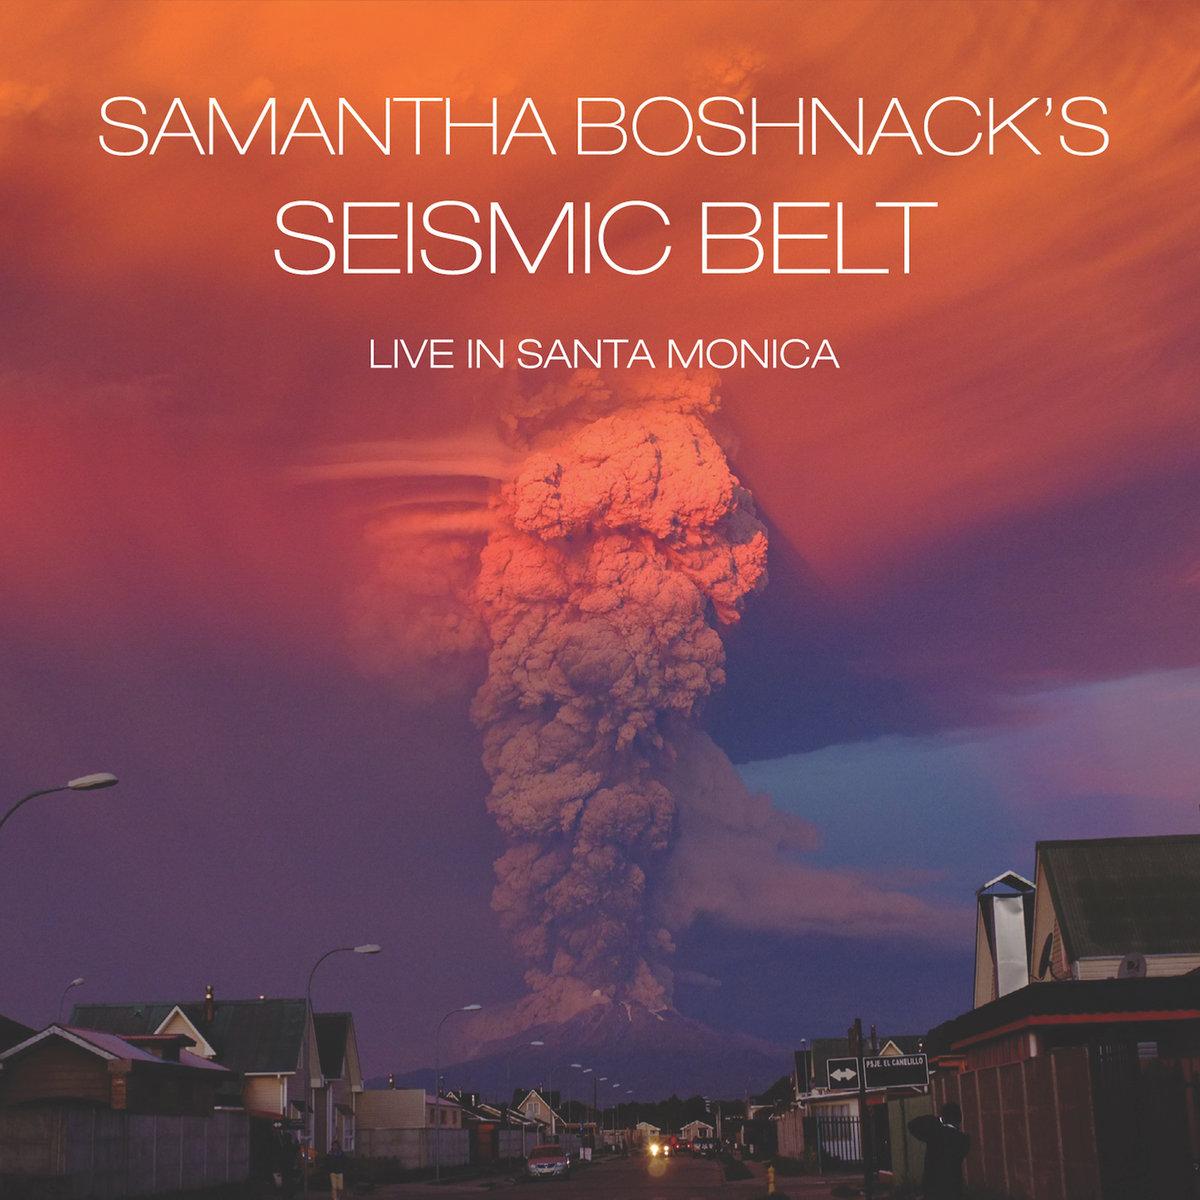 Samantha Boshnack's Seismic Belt // Live in Santa Monica